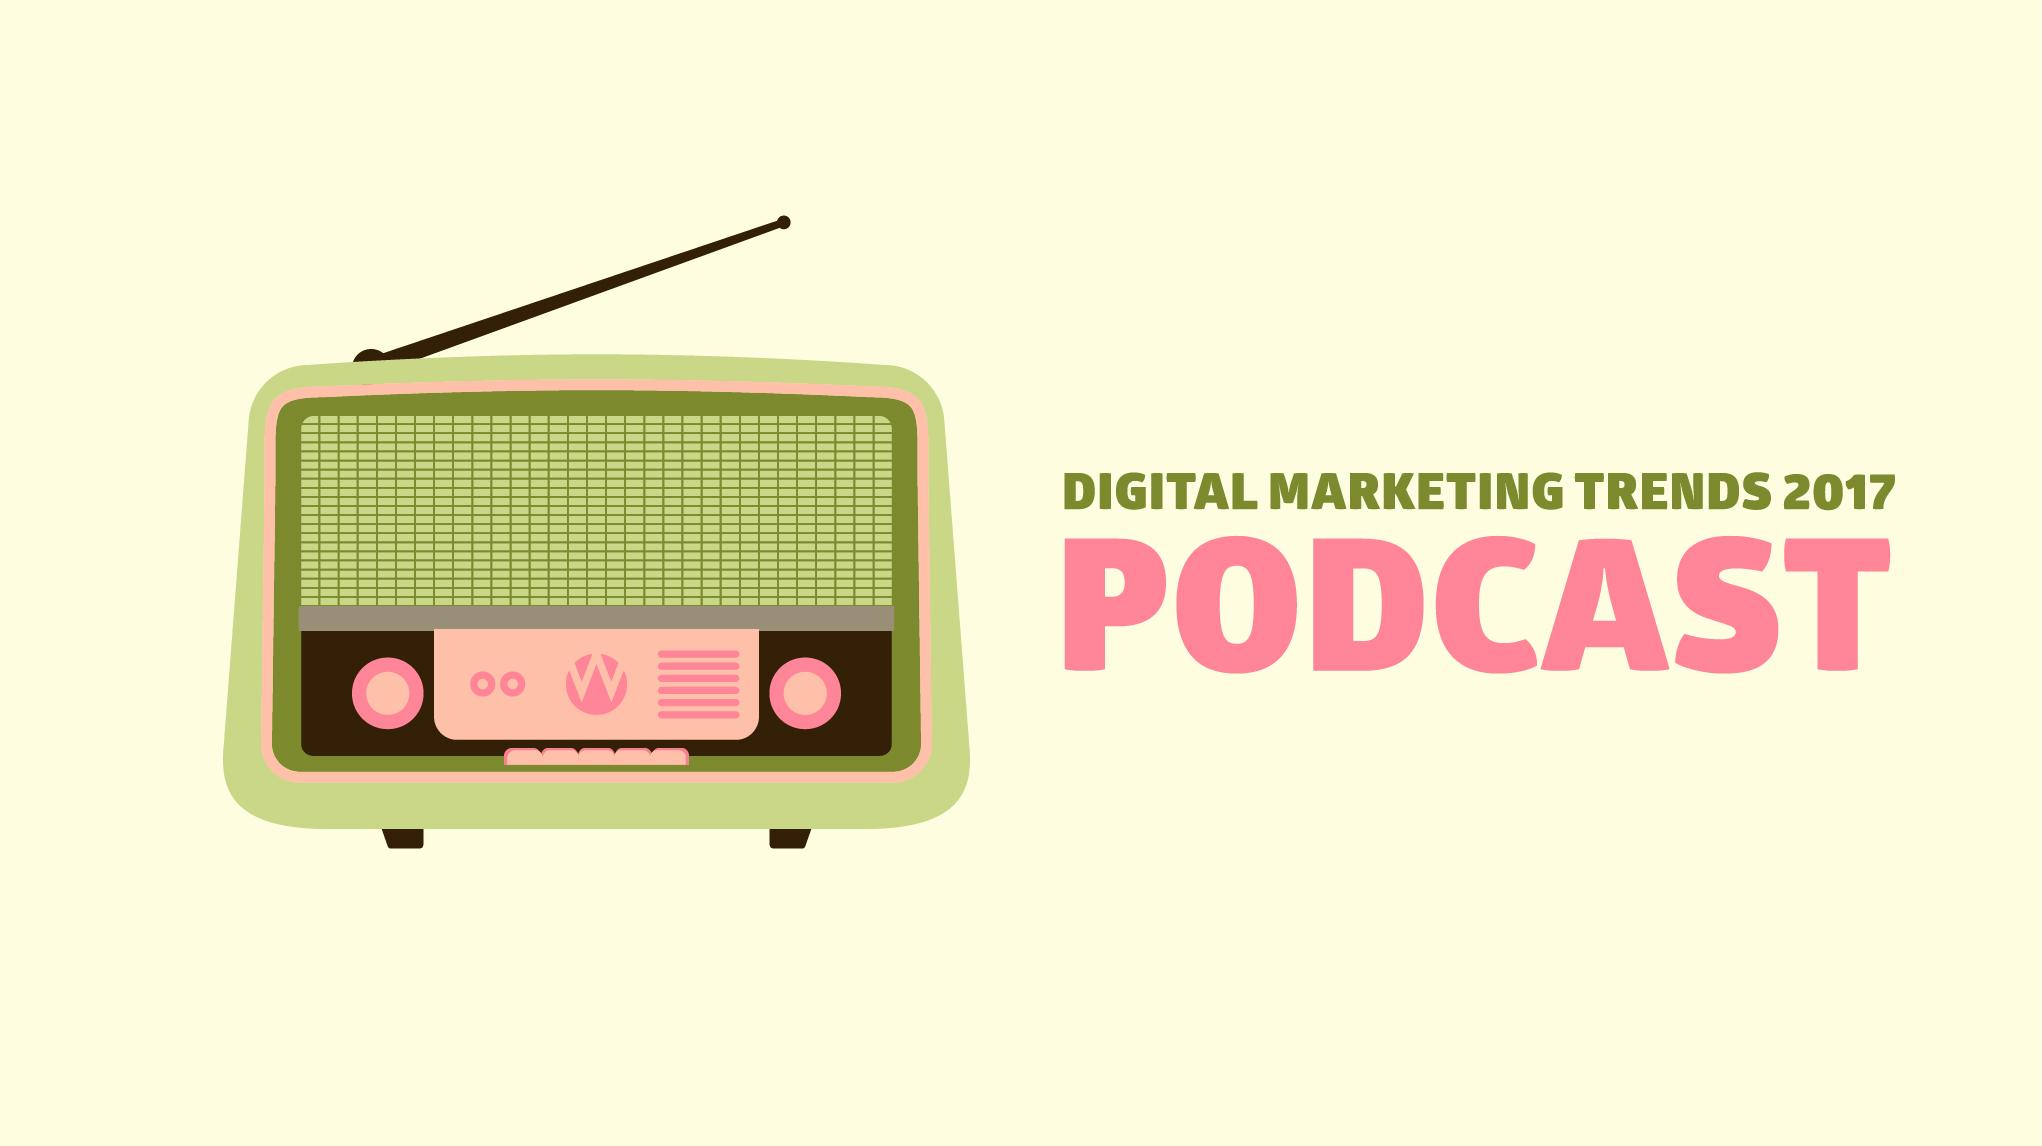 Digital marketing trends podcast blogpost image